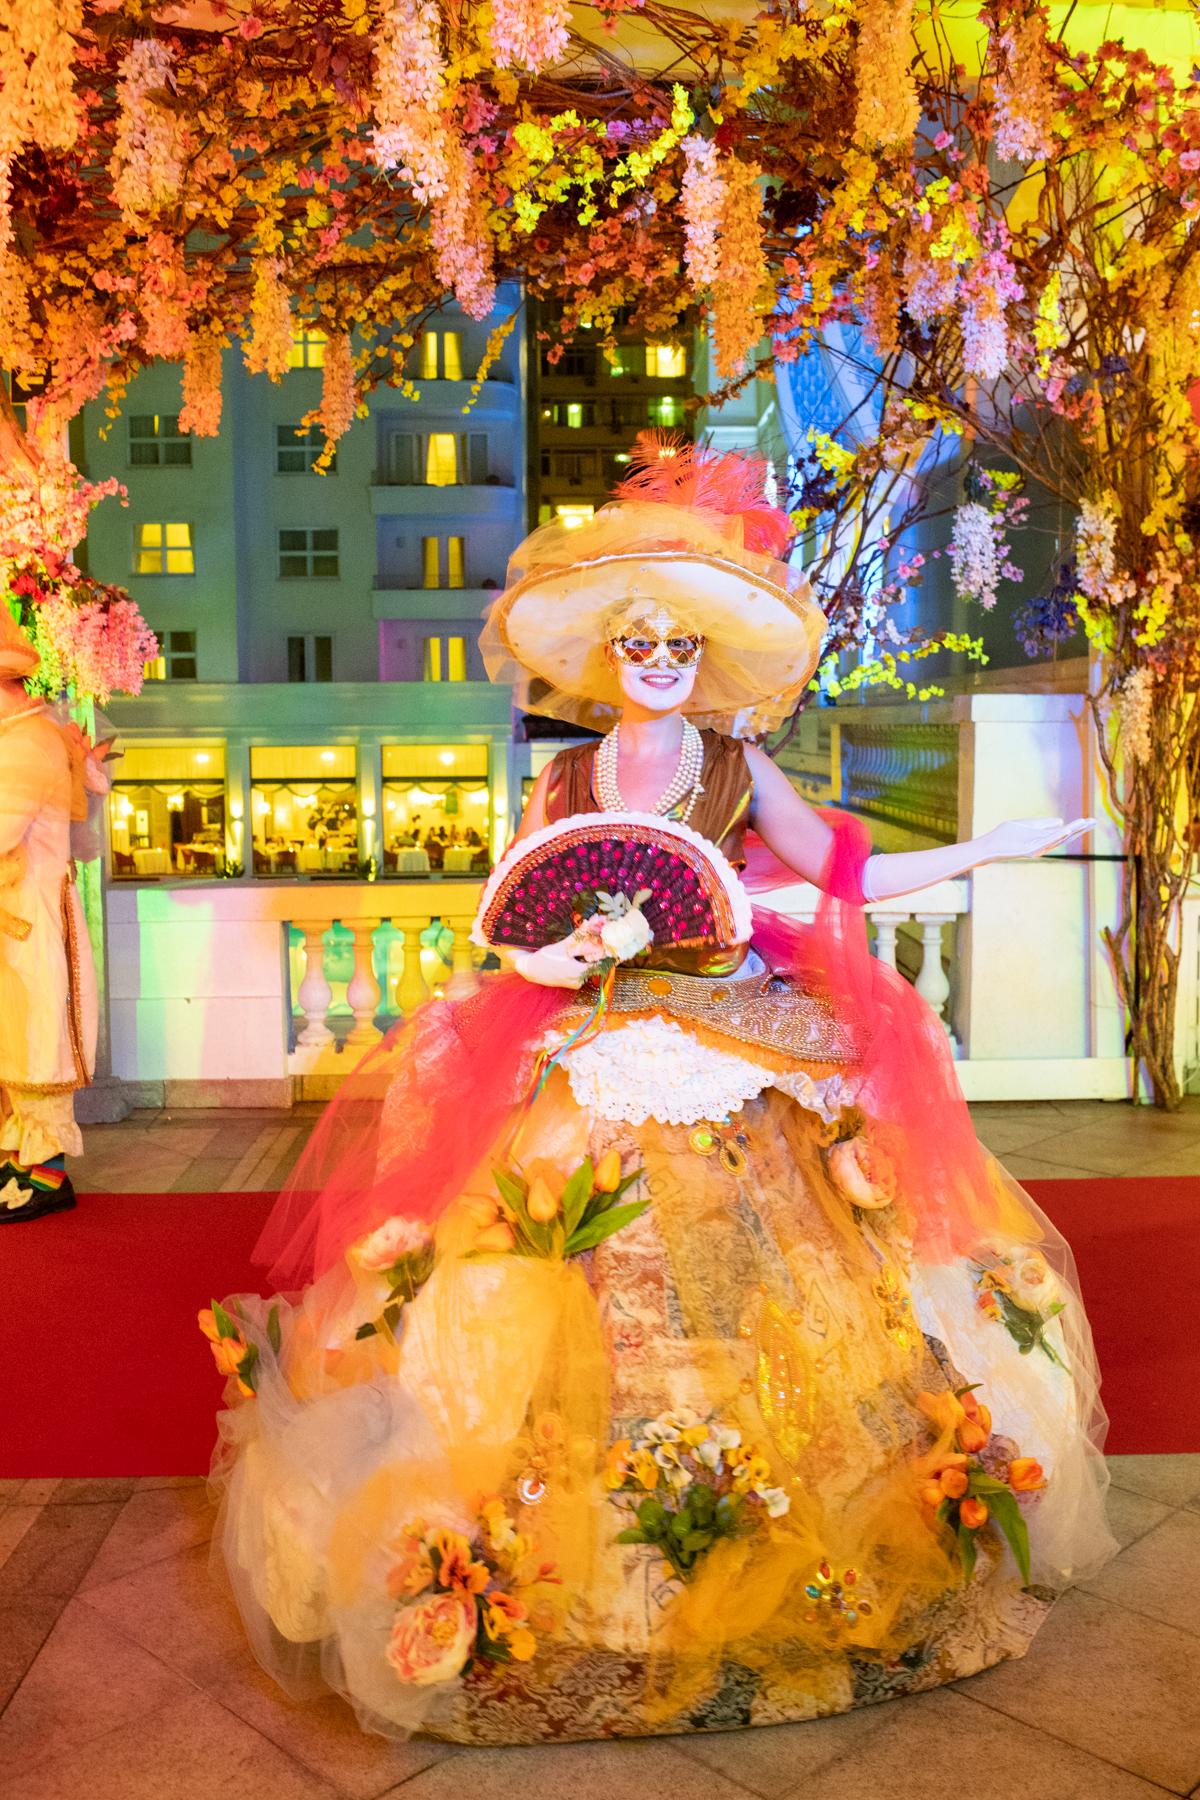 Stacie Flinner x Belmond Copacabana Carnival Ball-8.jpg